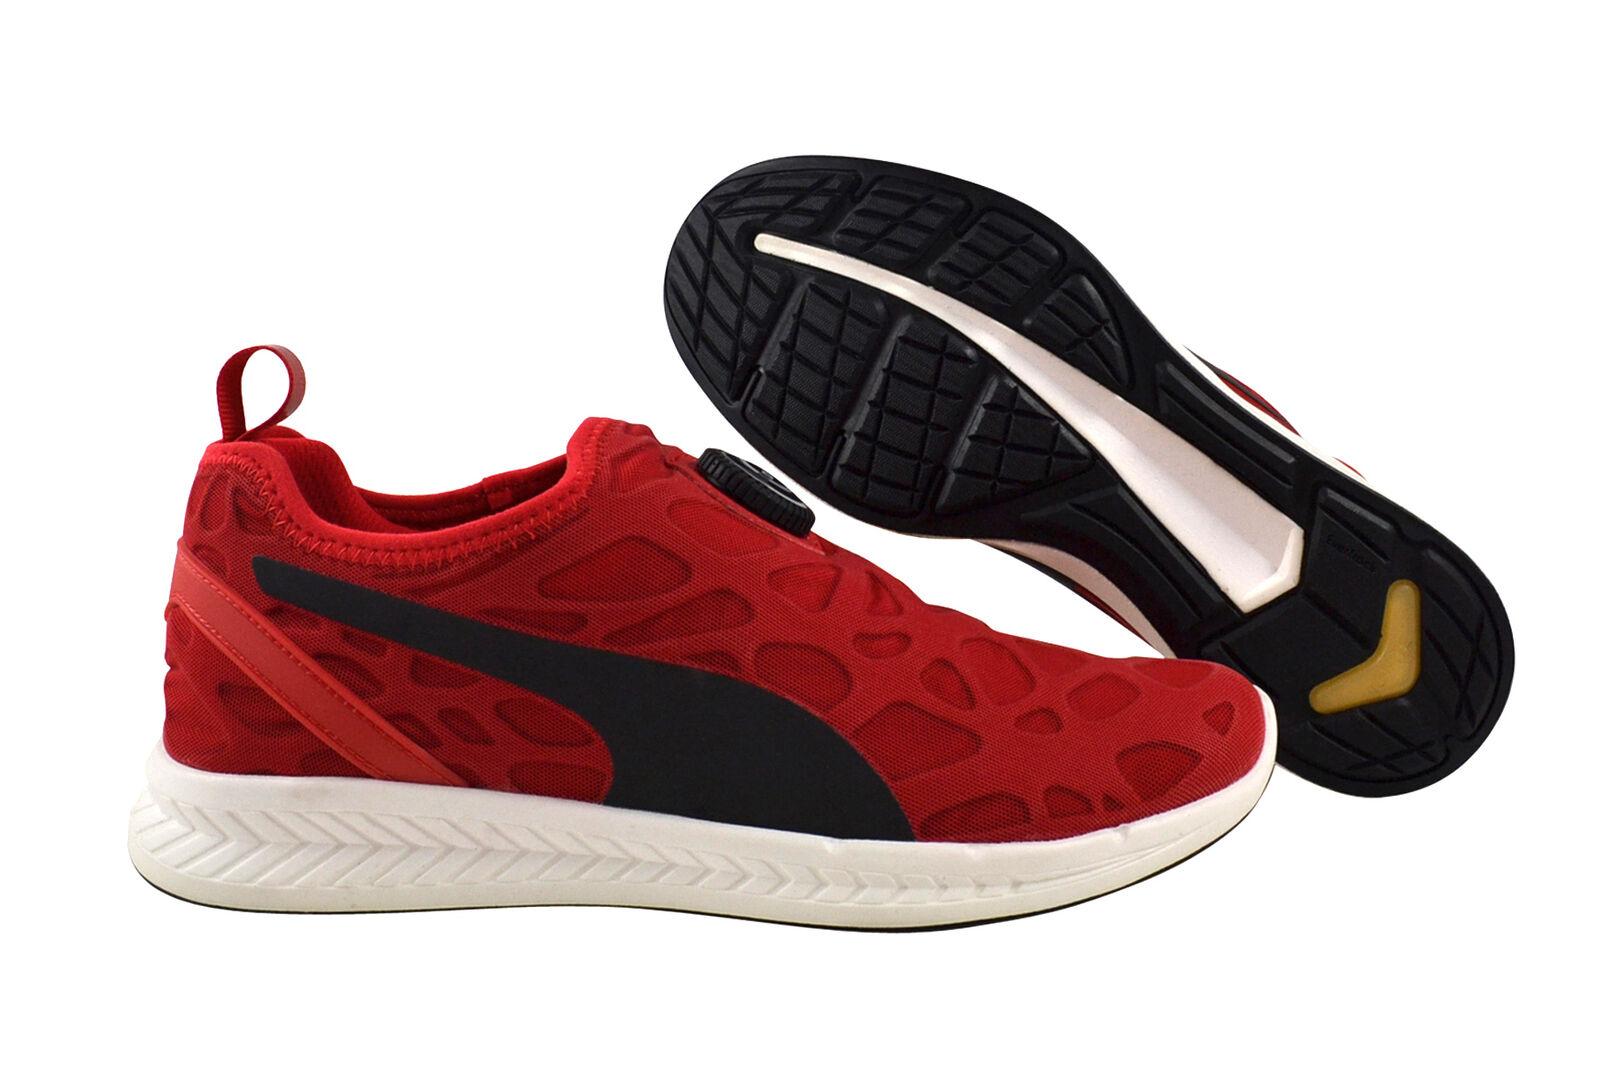 Puma DISC Blaze Sleeve Ignite Foam red/black/white Sneaker/Schuhe blau 360946 03